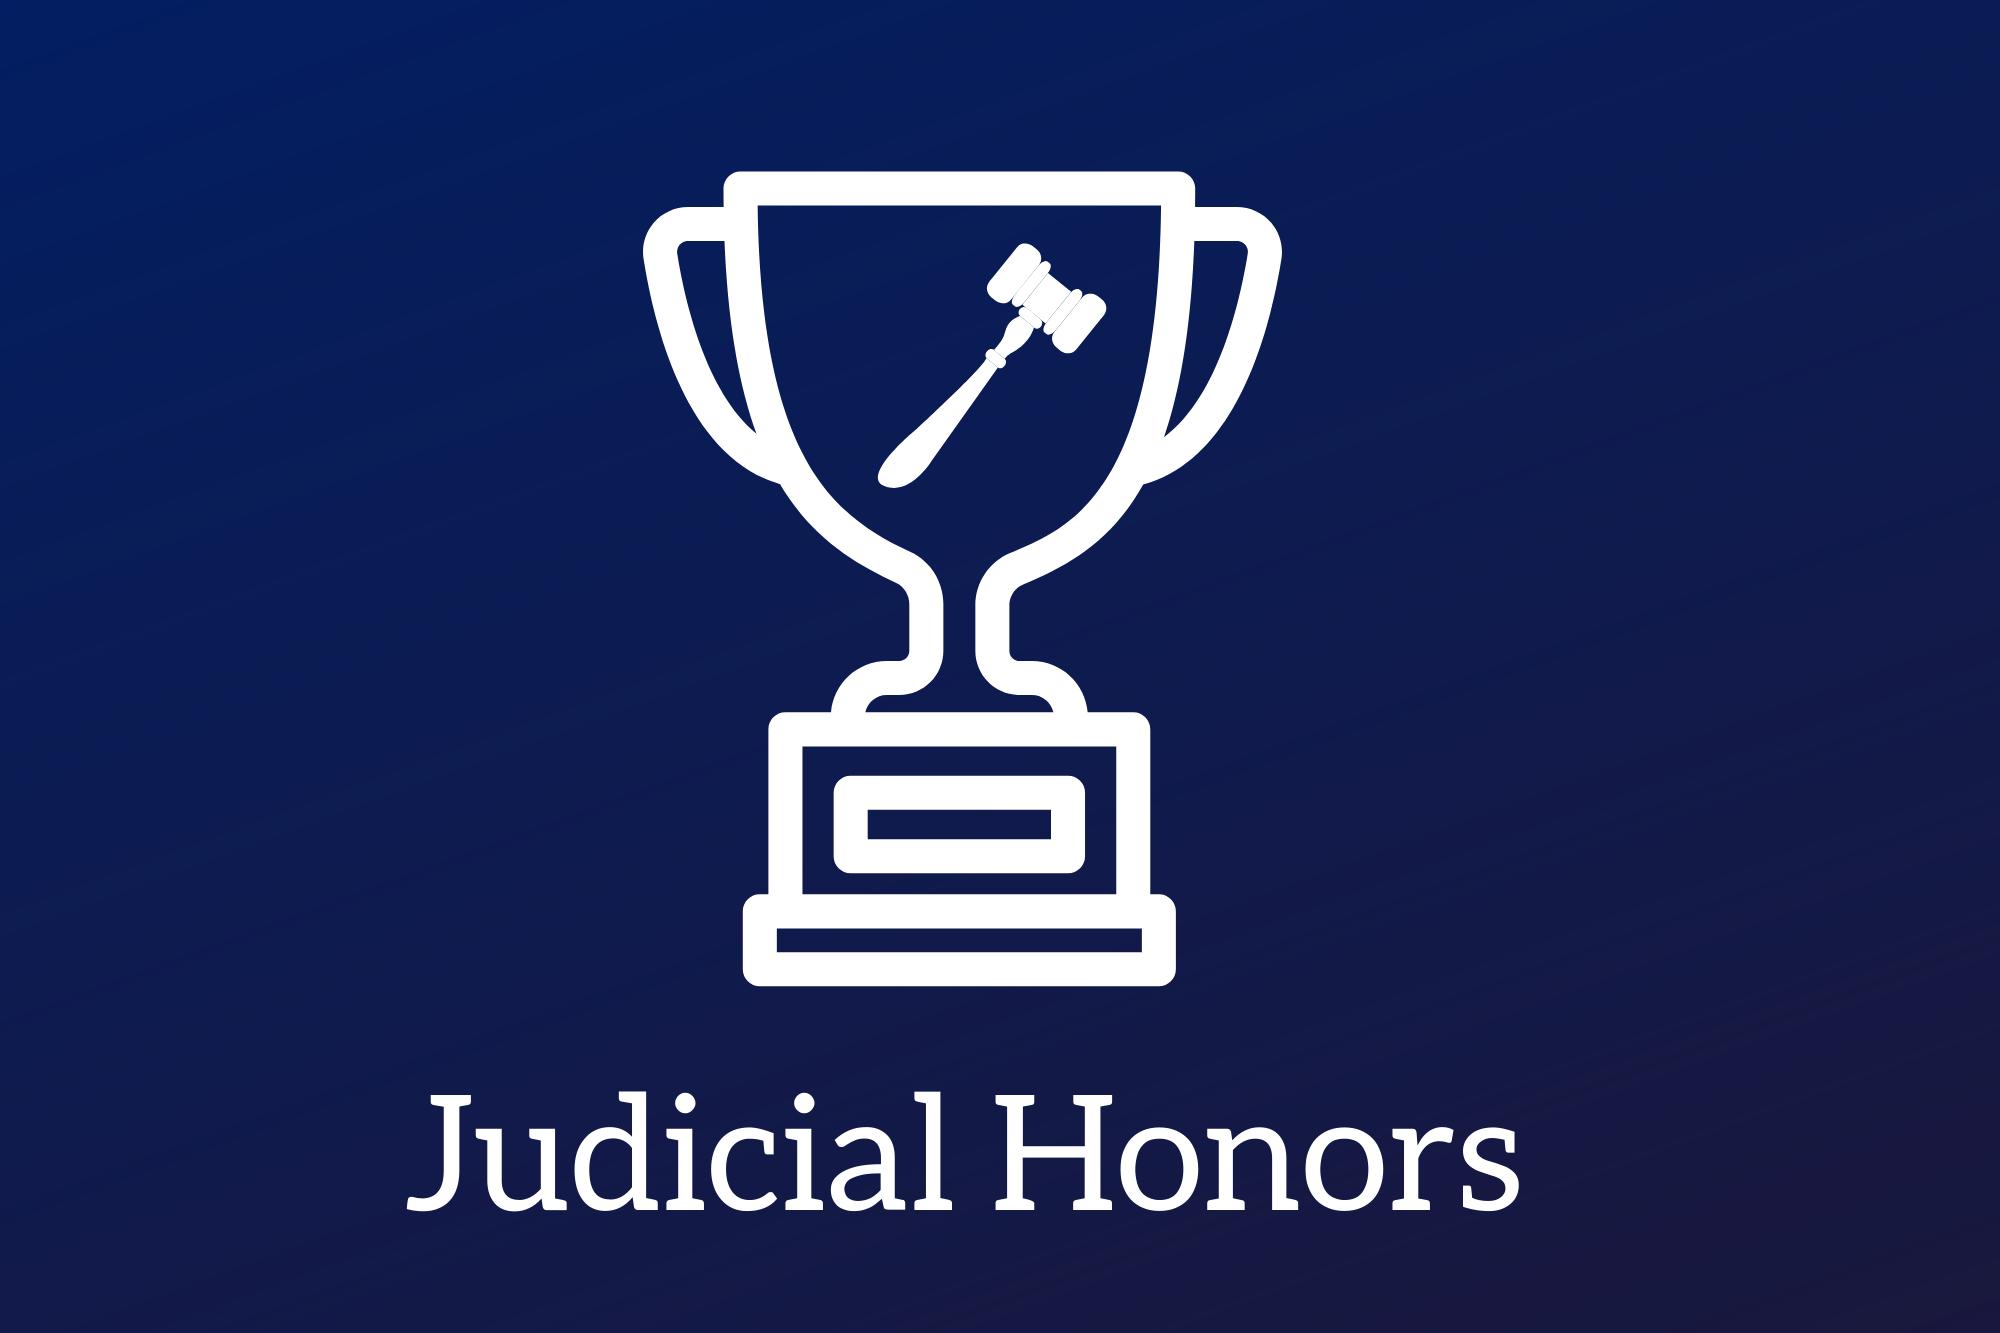 Judicial Honors